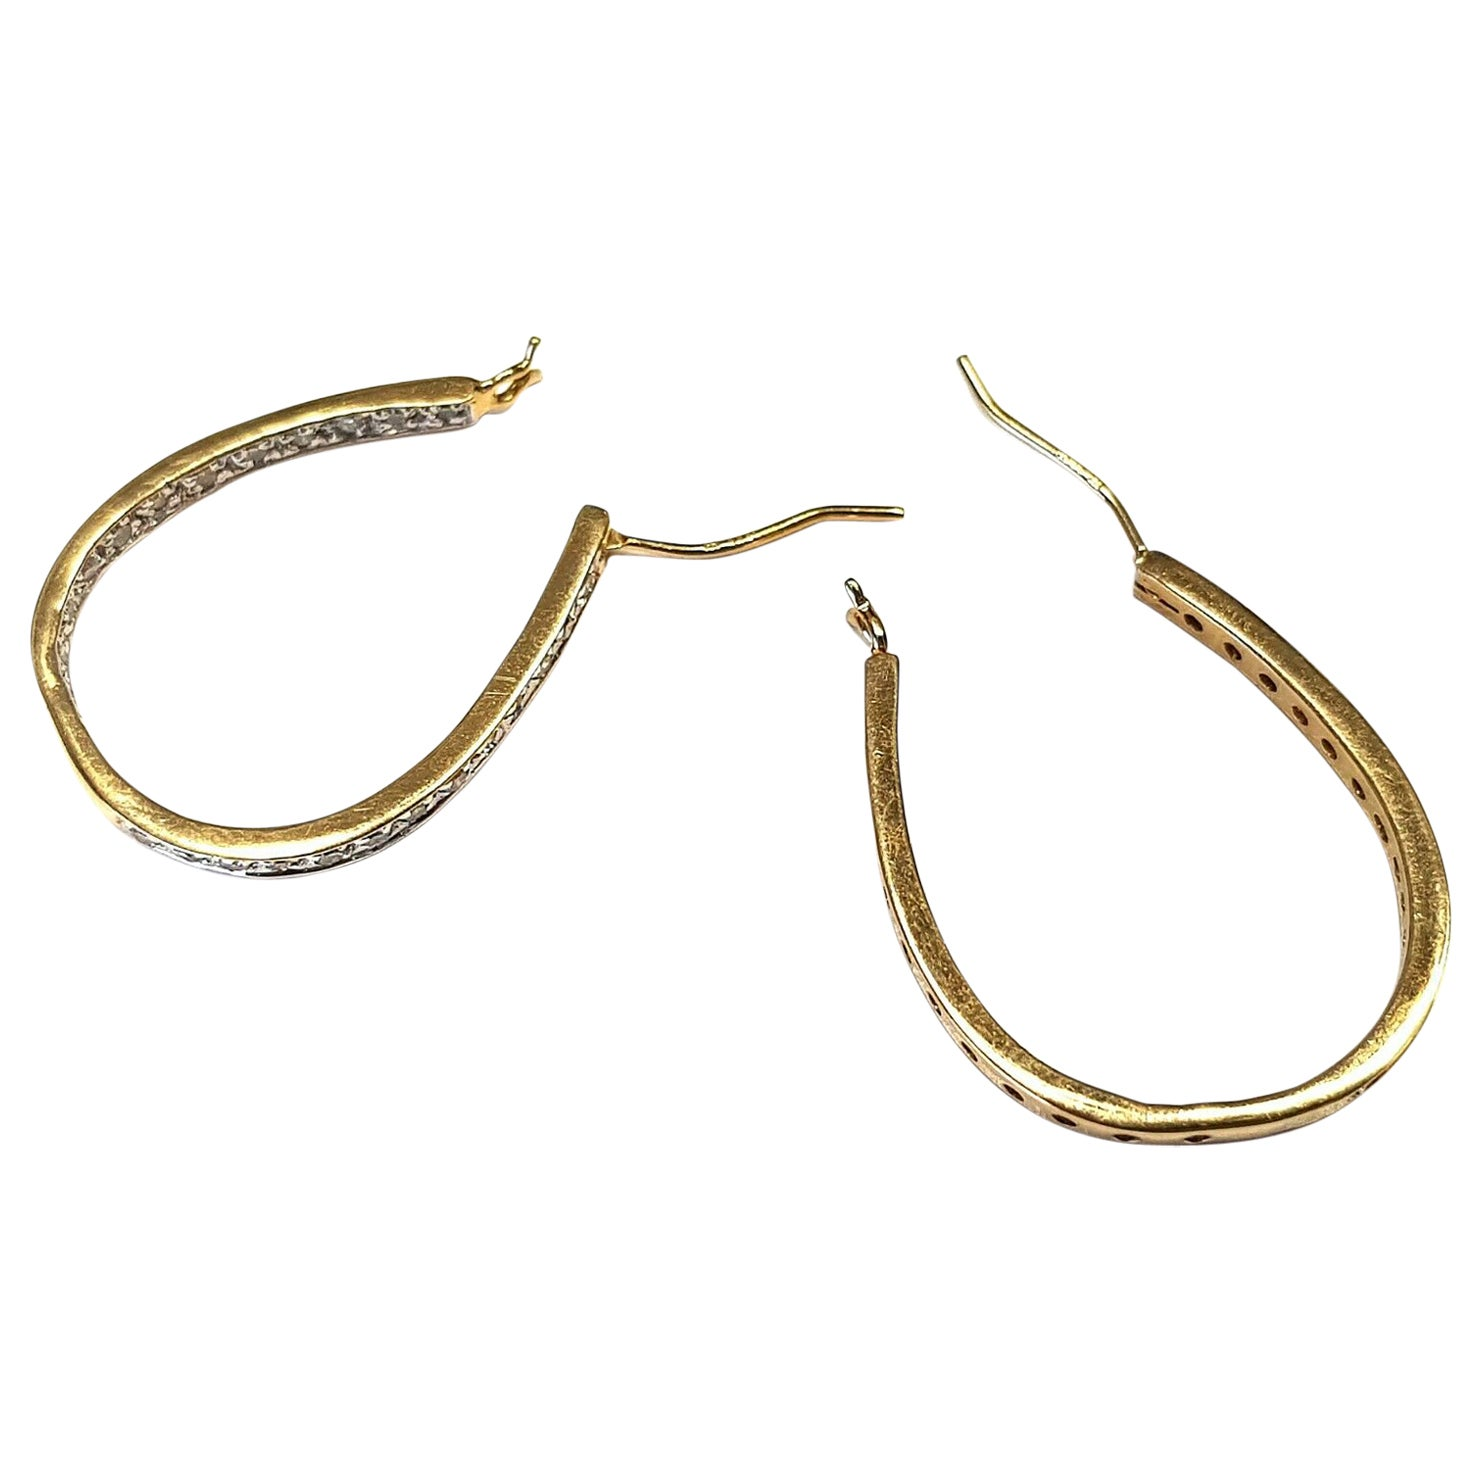 14 Karat Yellow Gold Horseshoe Hoop Earrings 1.00 Carat Diamonds